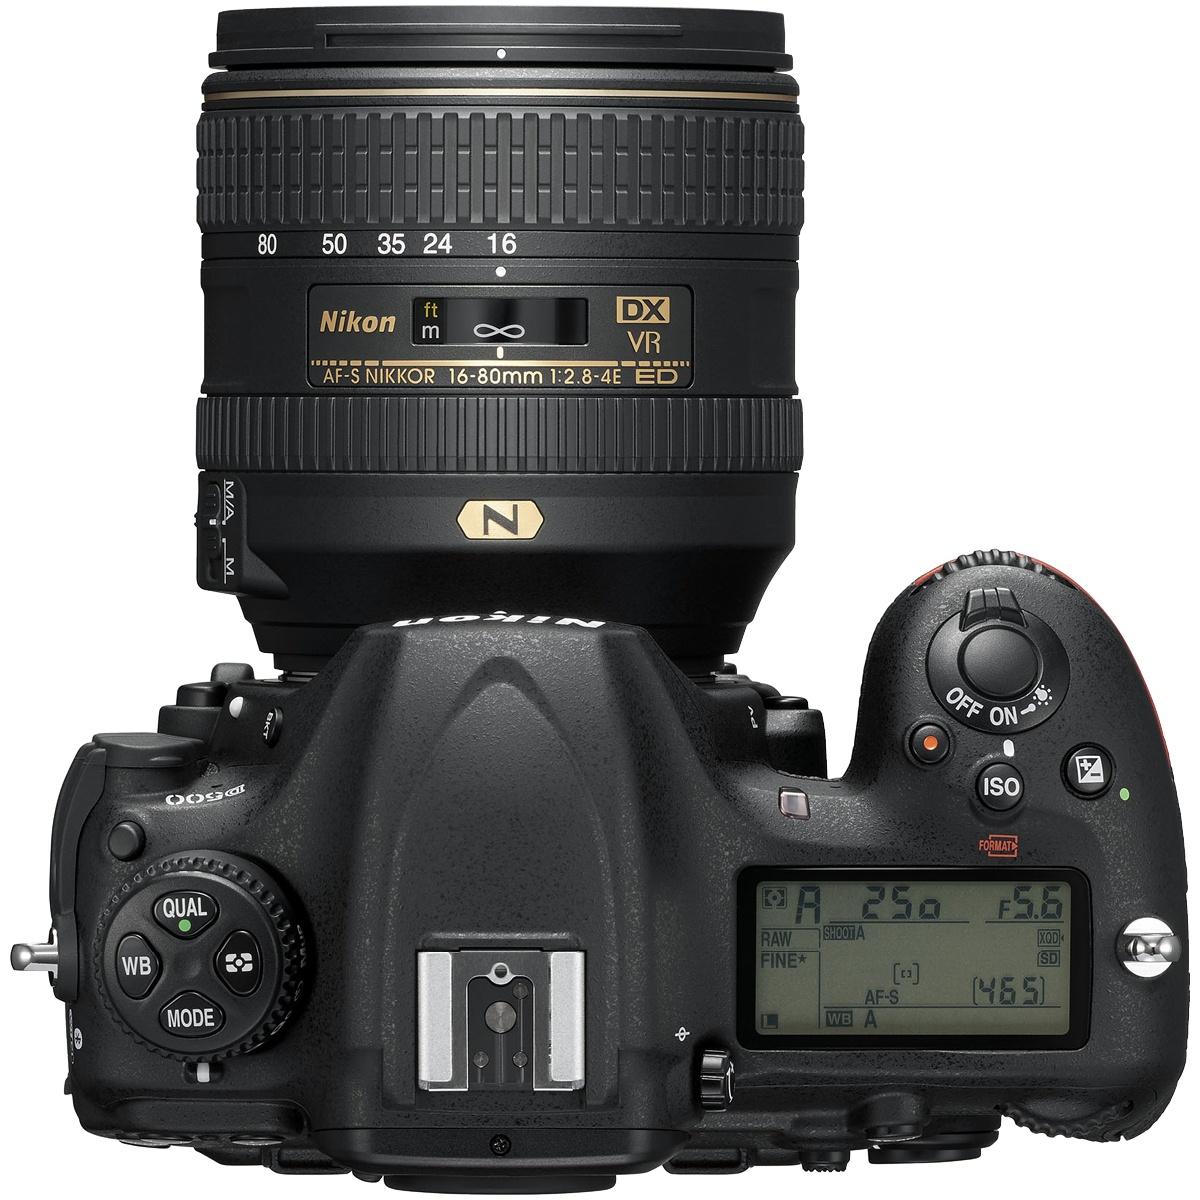 Nikon D500 Kit mit 16-80 mm 1:2,8-4